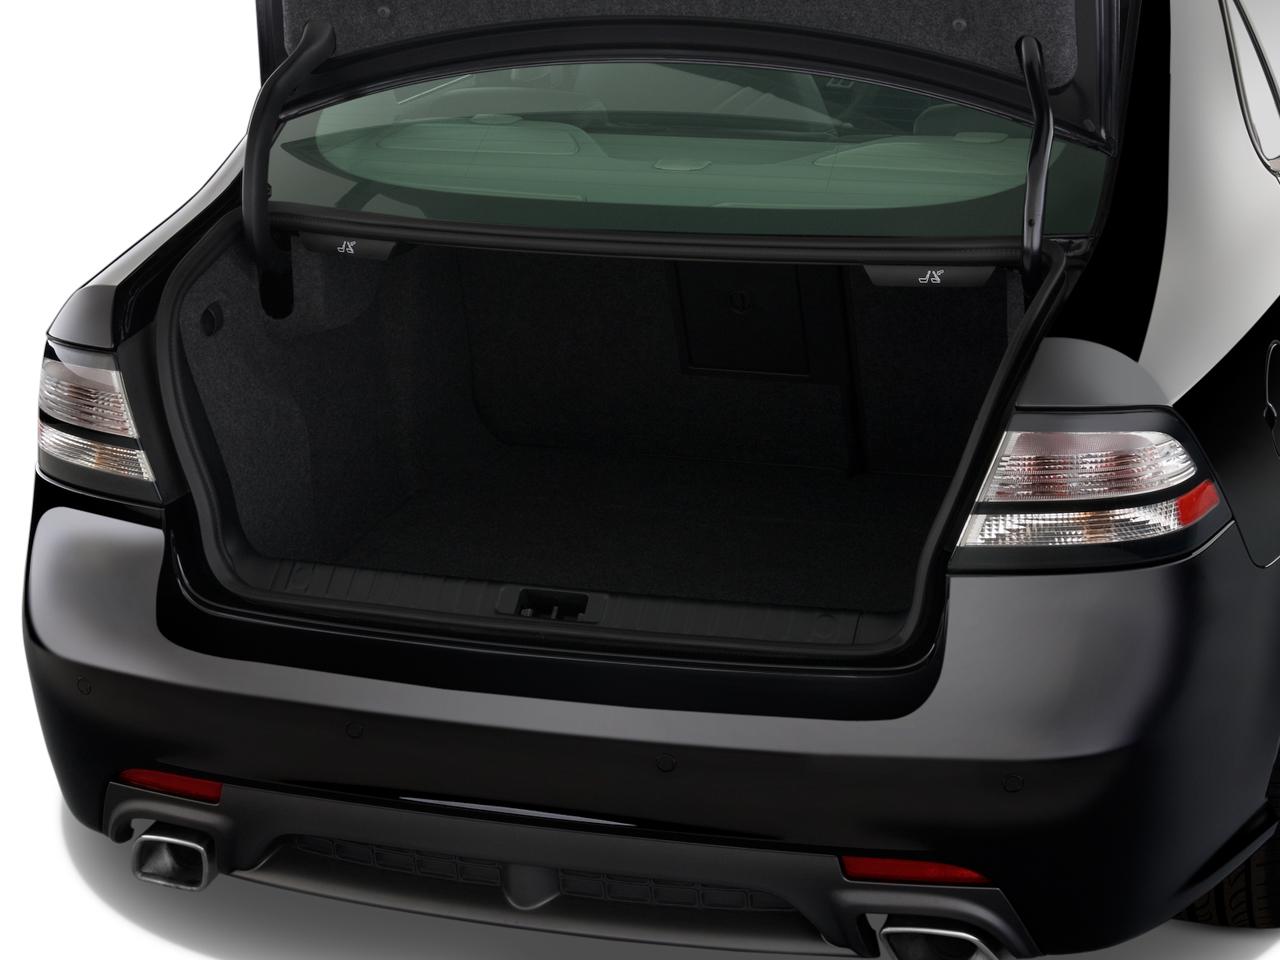 2008 saab turbo x sportcombi saab 9 3 midsize wagon review automobile magazine. Black Bedroom Furniture Sets. Home Design Ideas